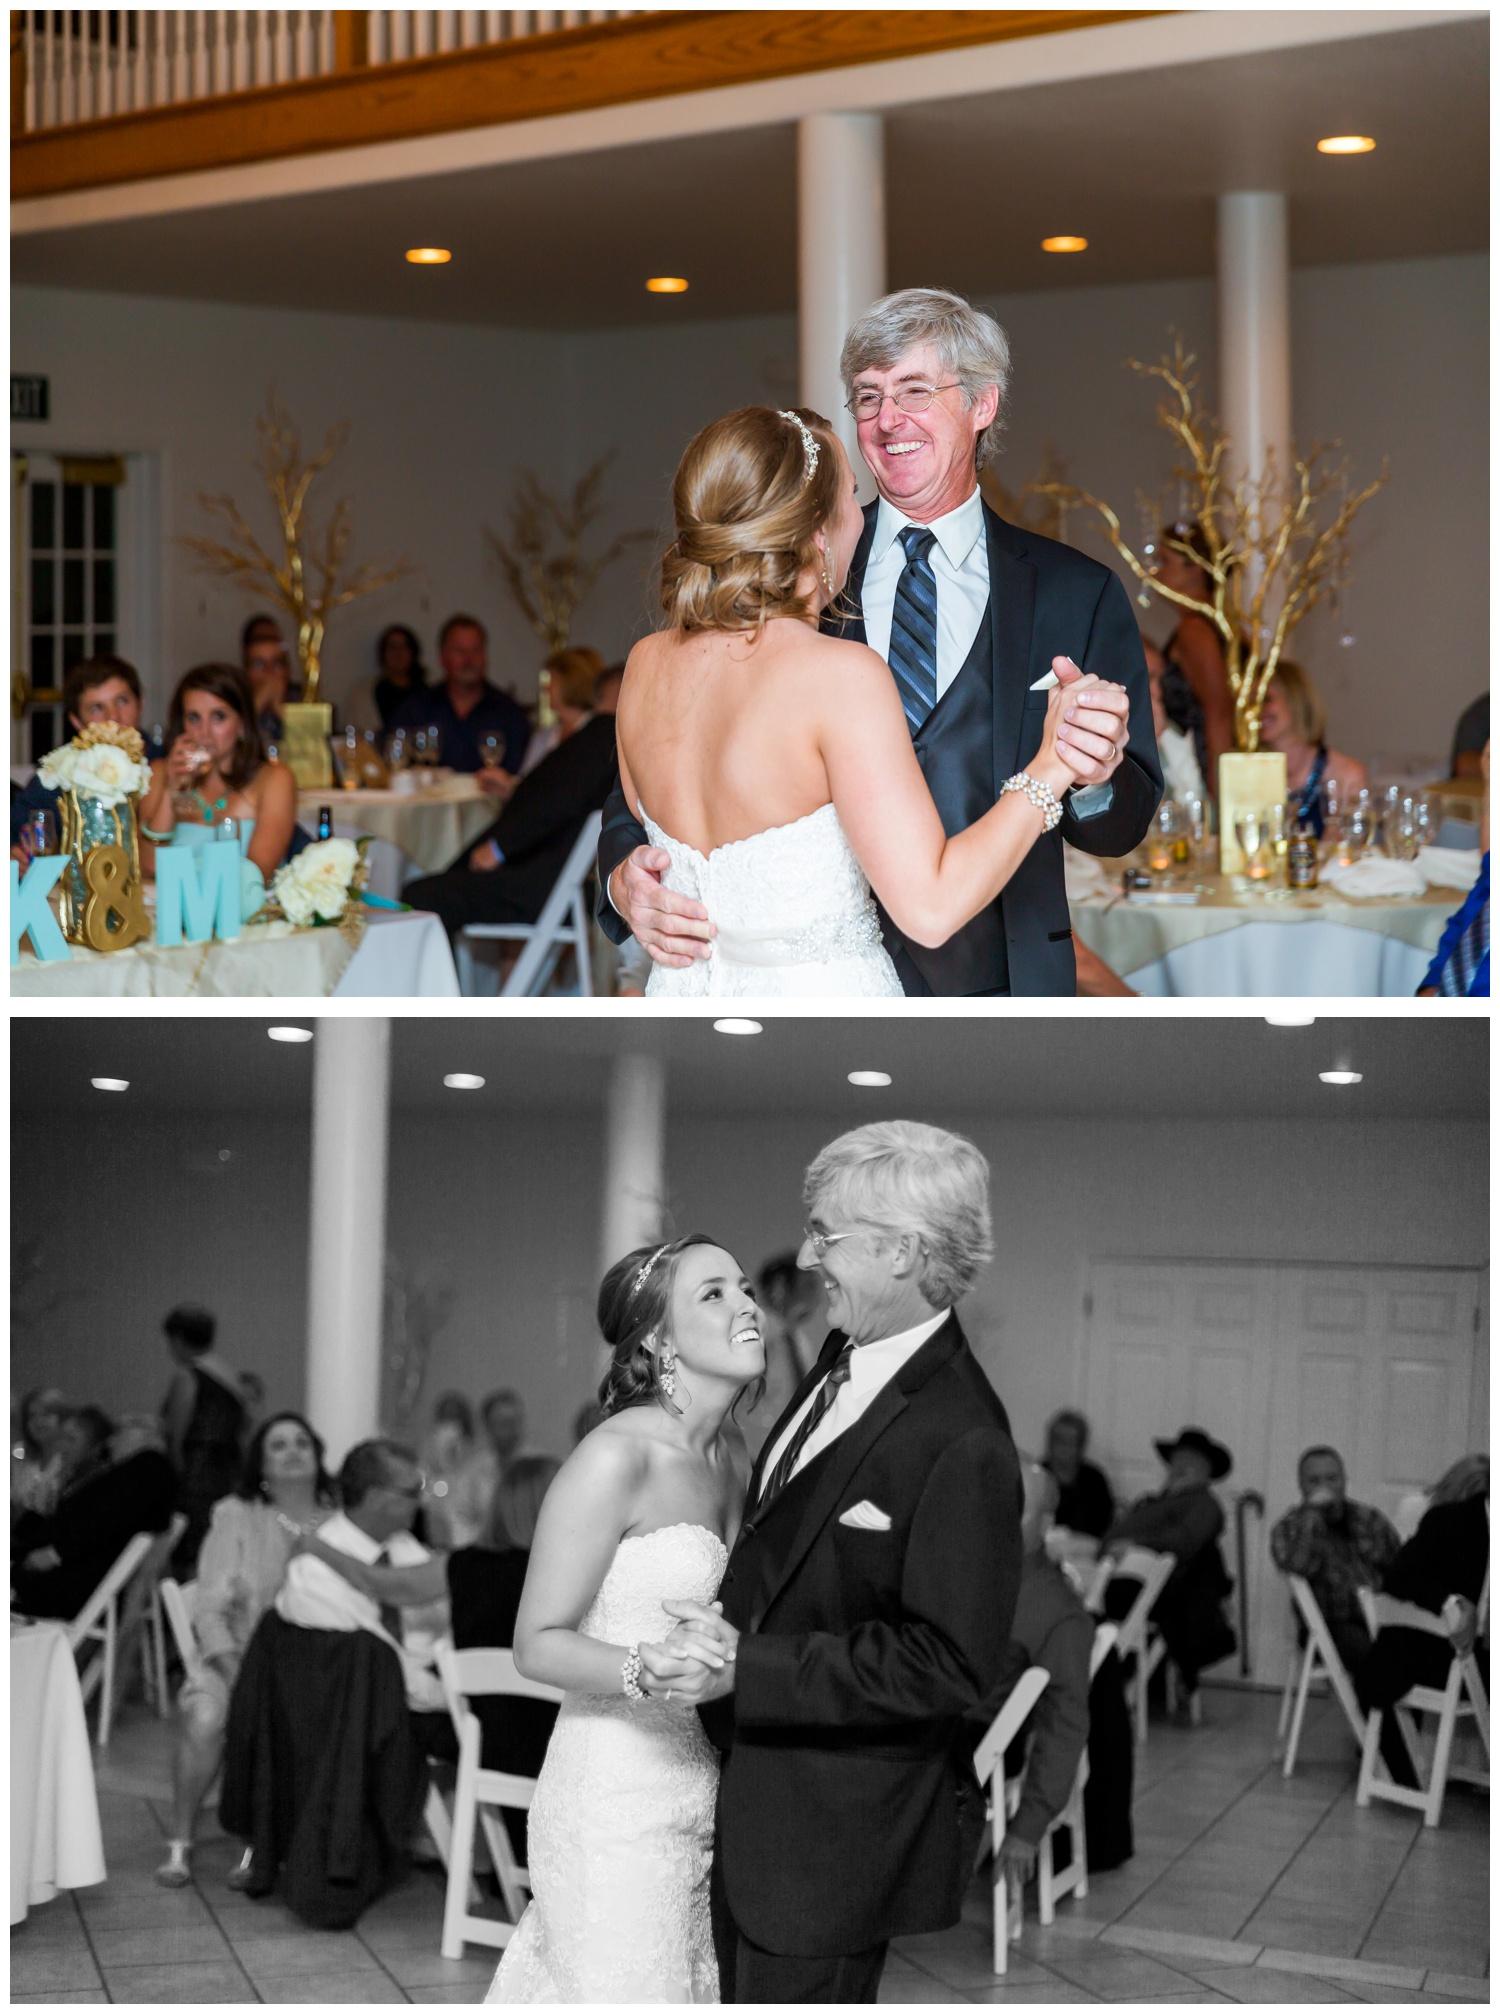 lionscrest manor wedding photography49.jpg